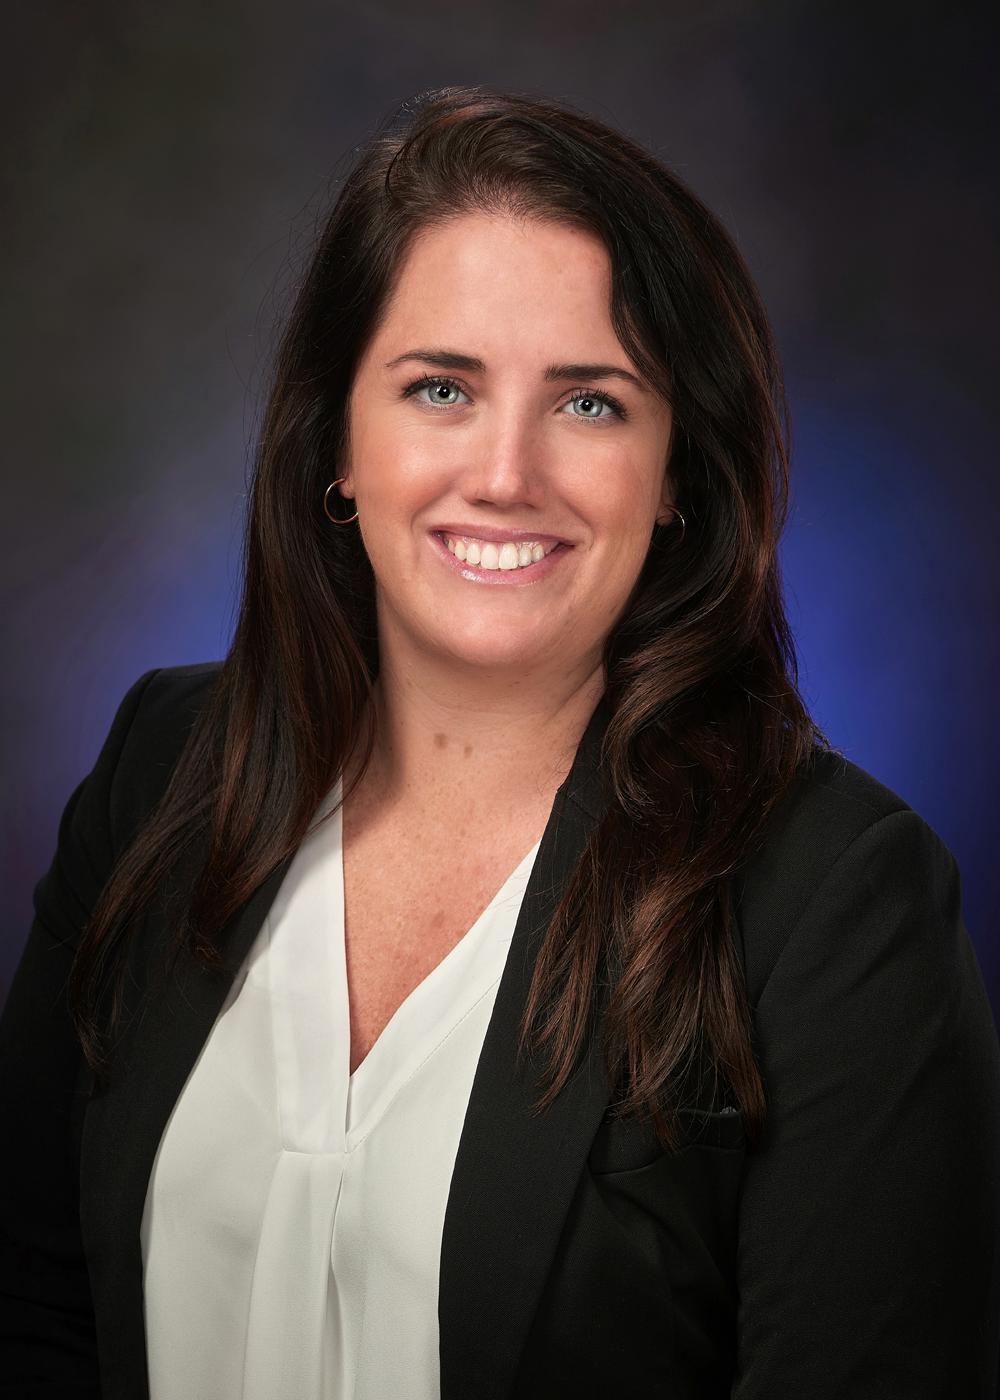 KATIE LYN ROBSHAW Insurance Agent